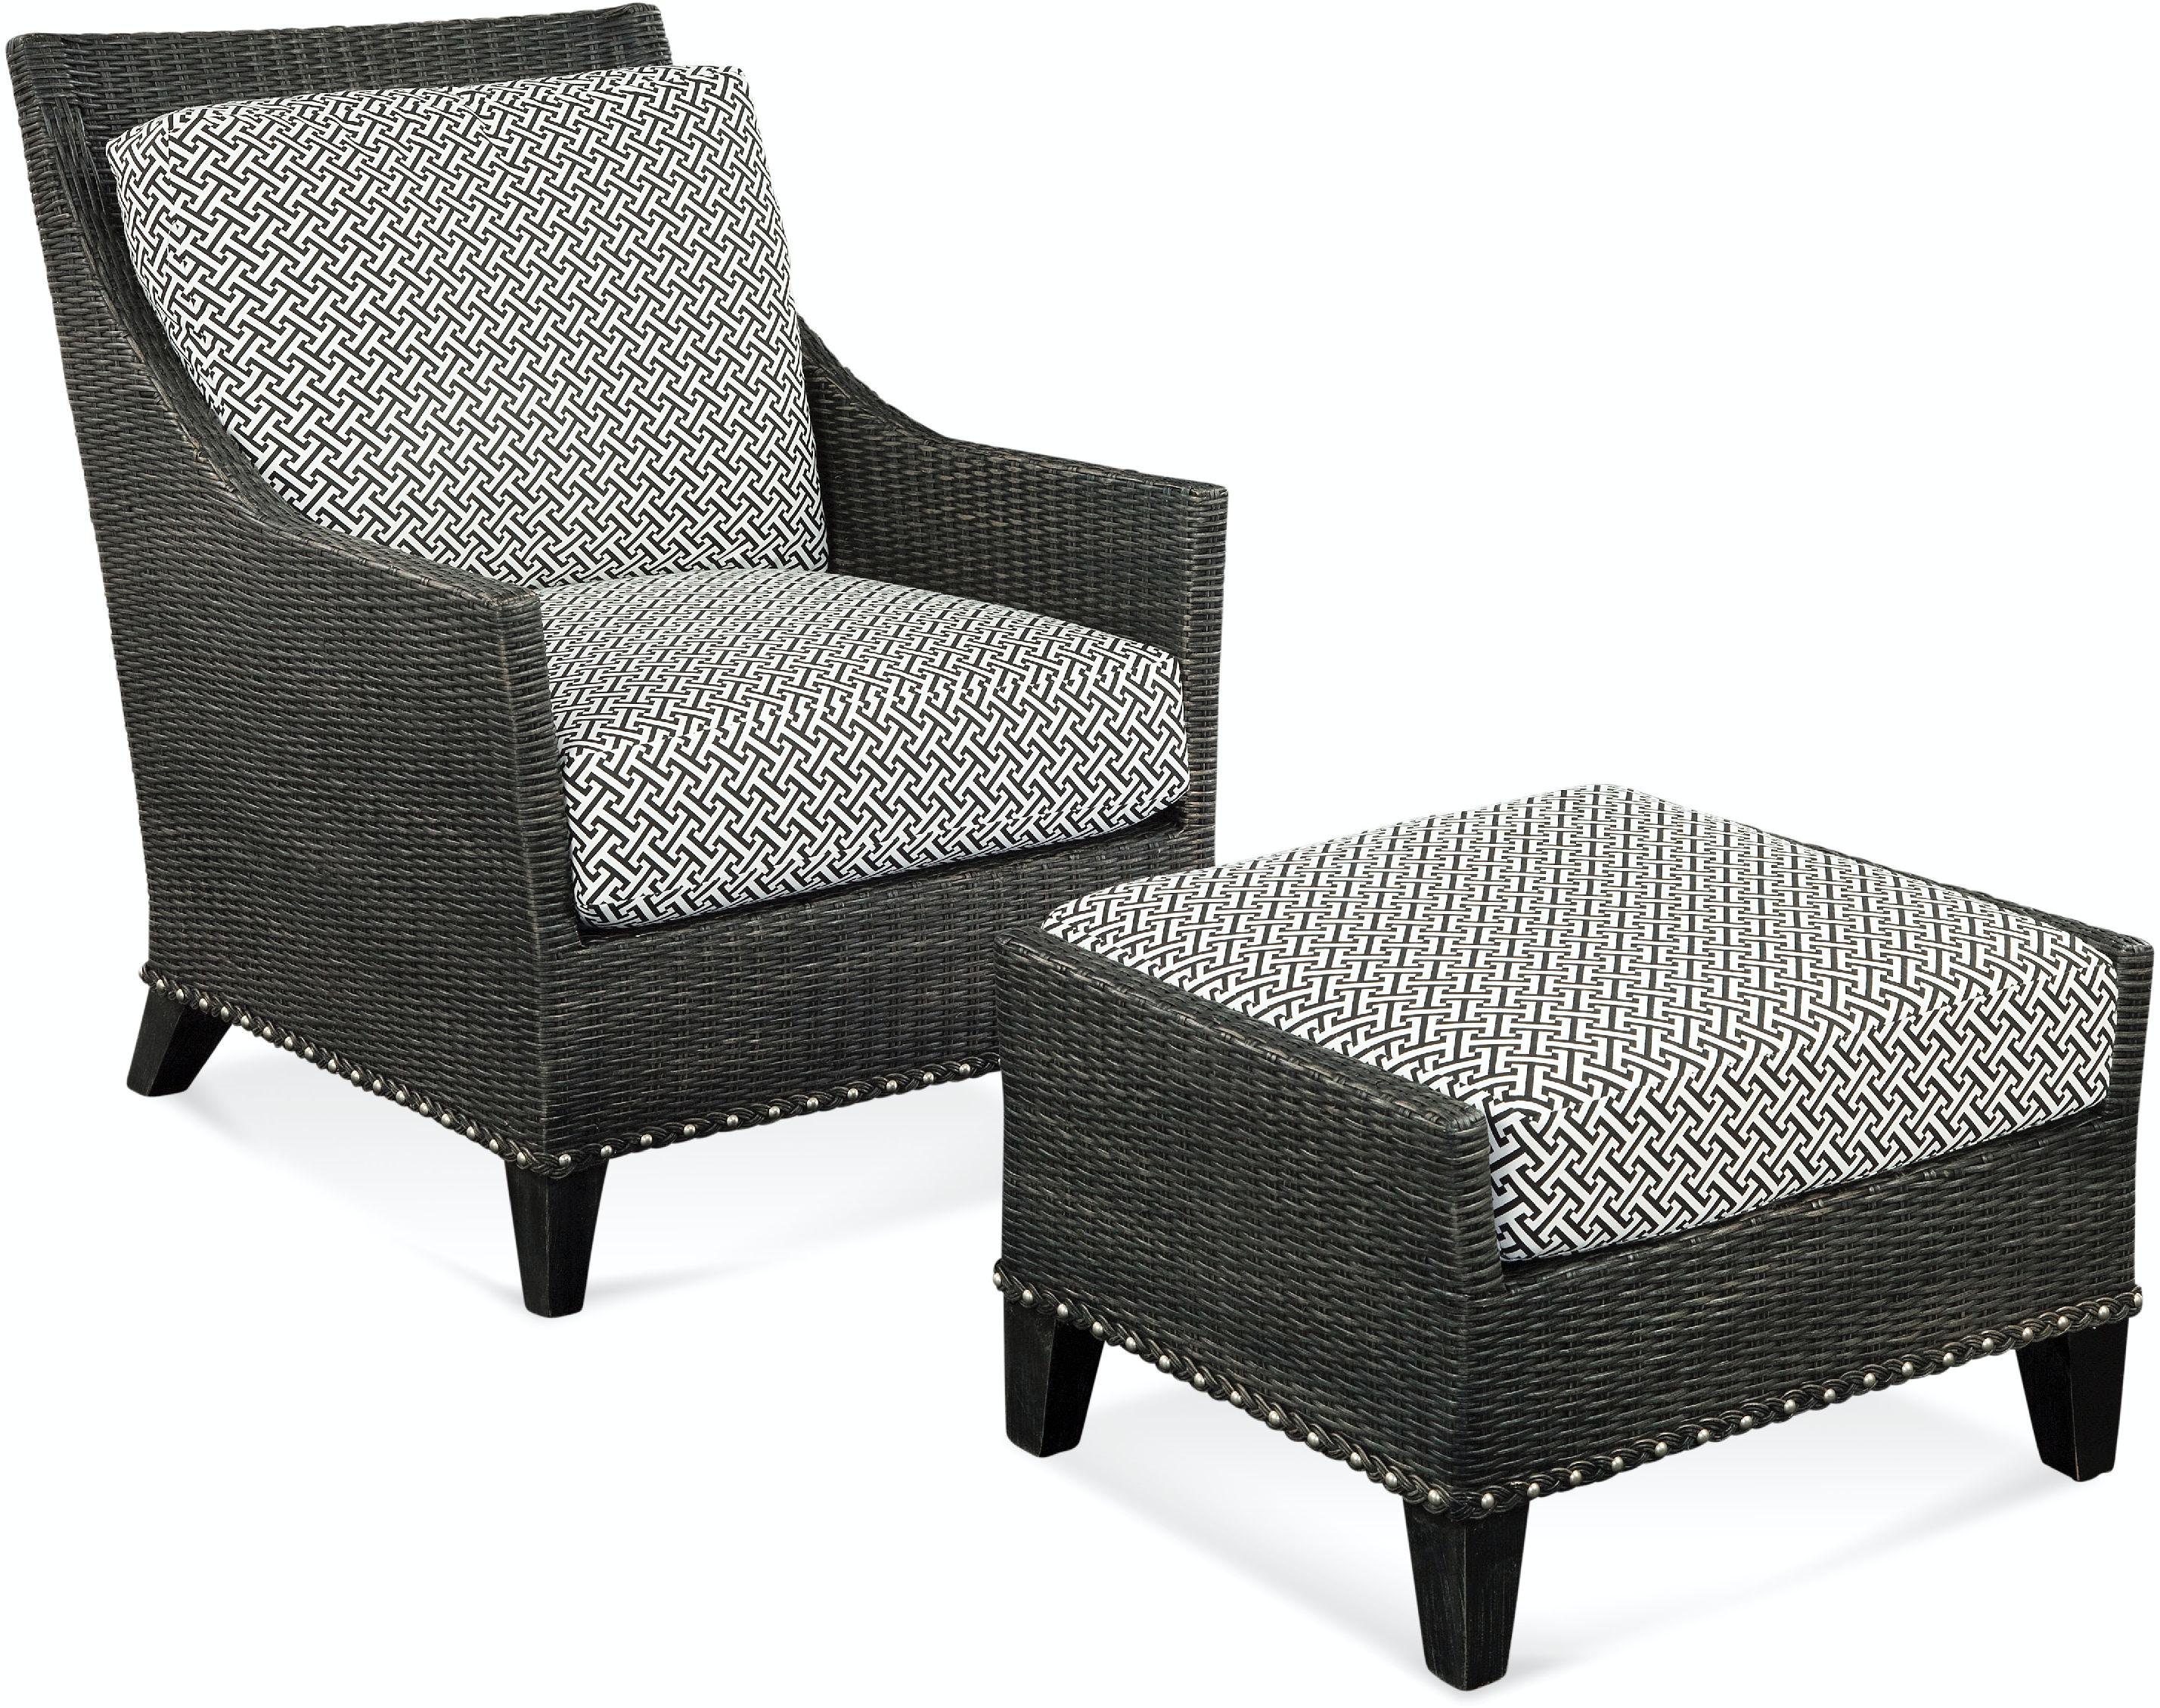 Chair 1965-001SN